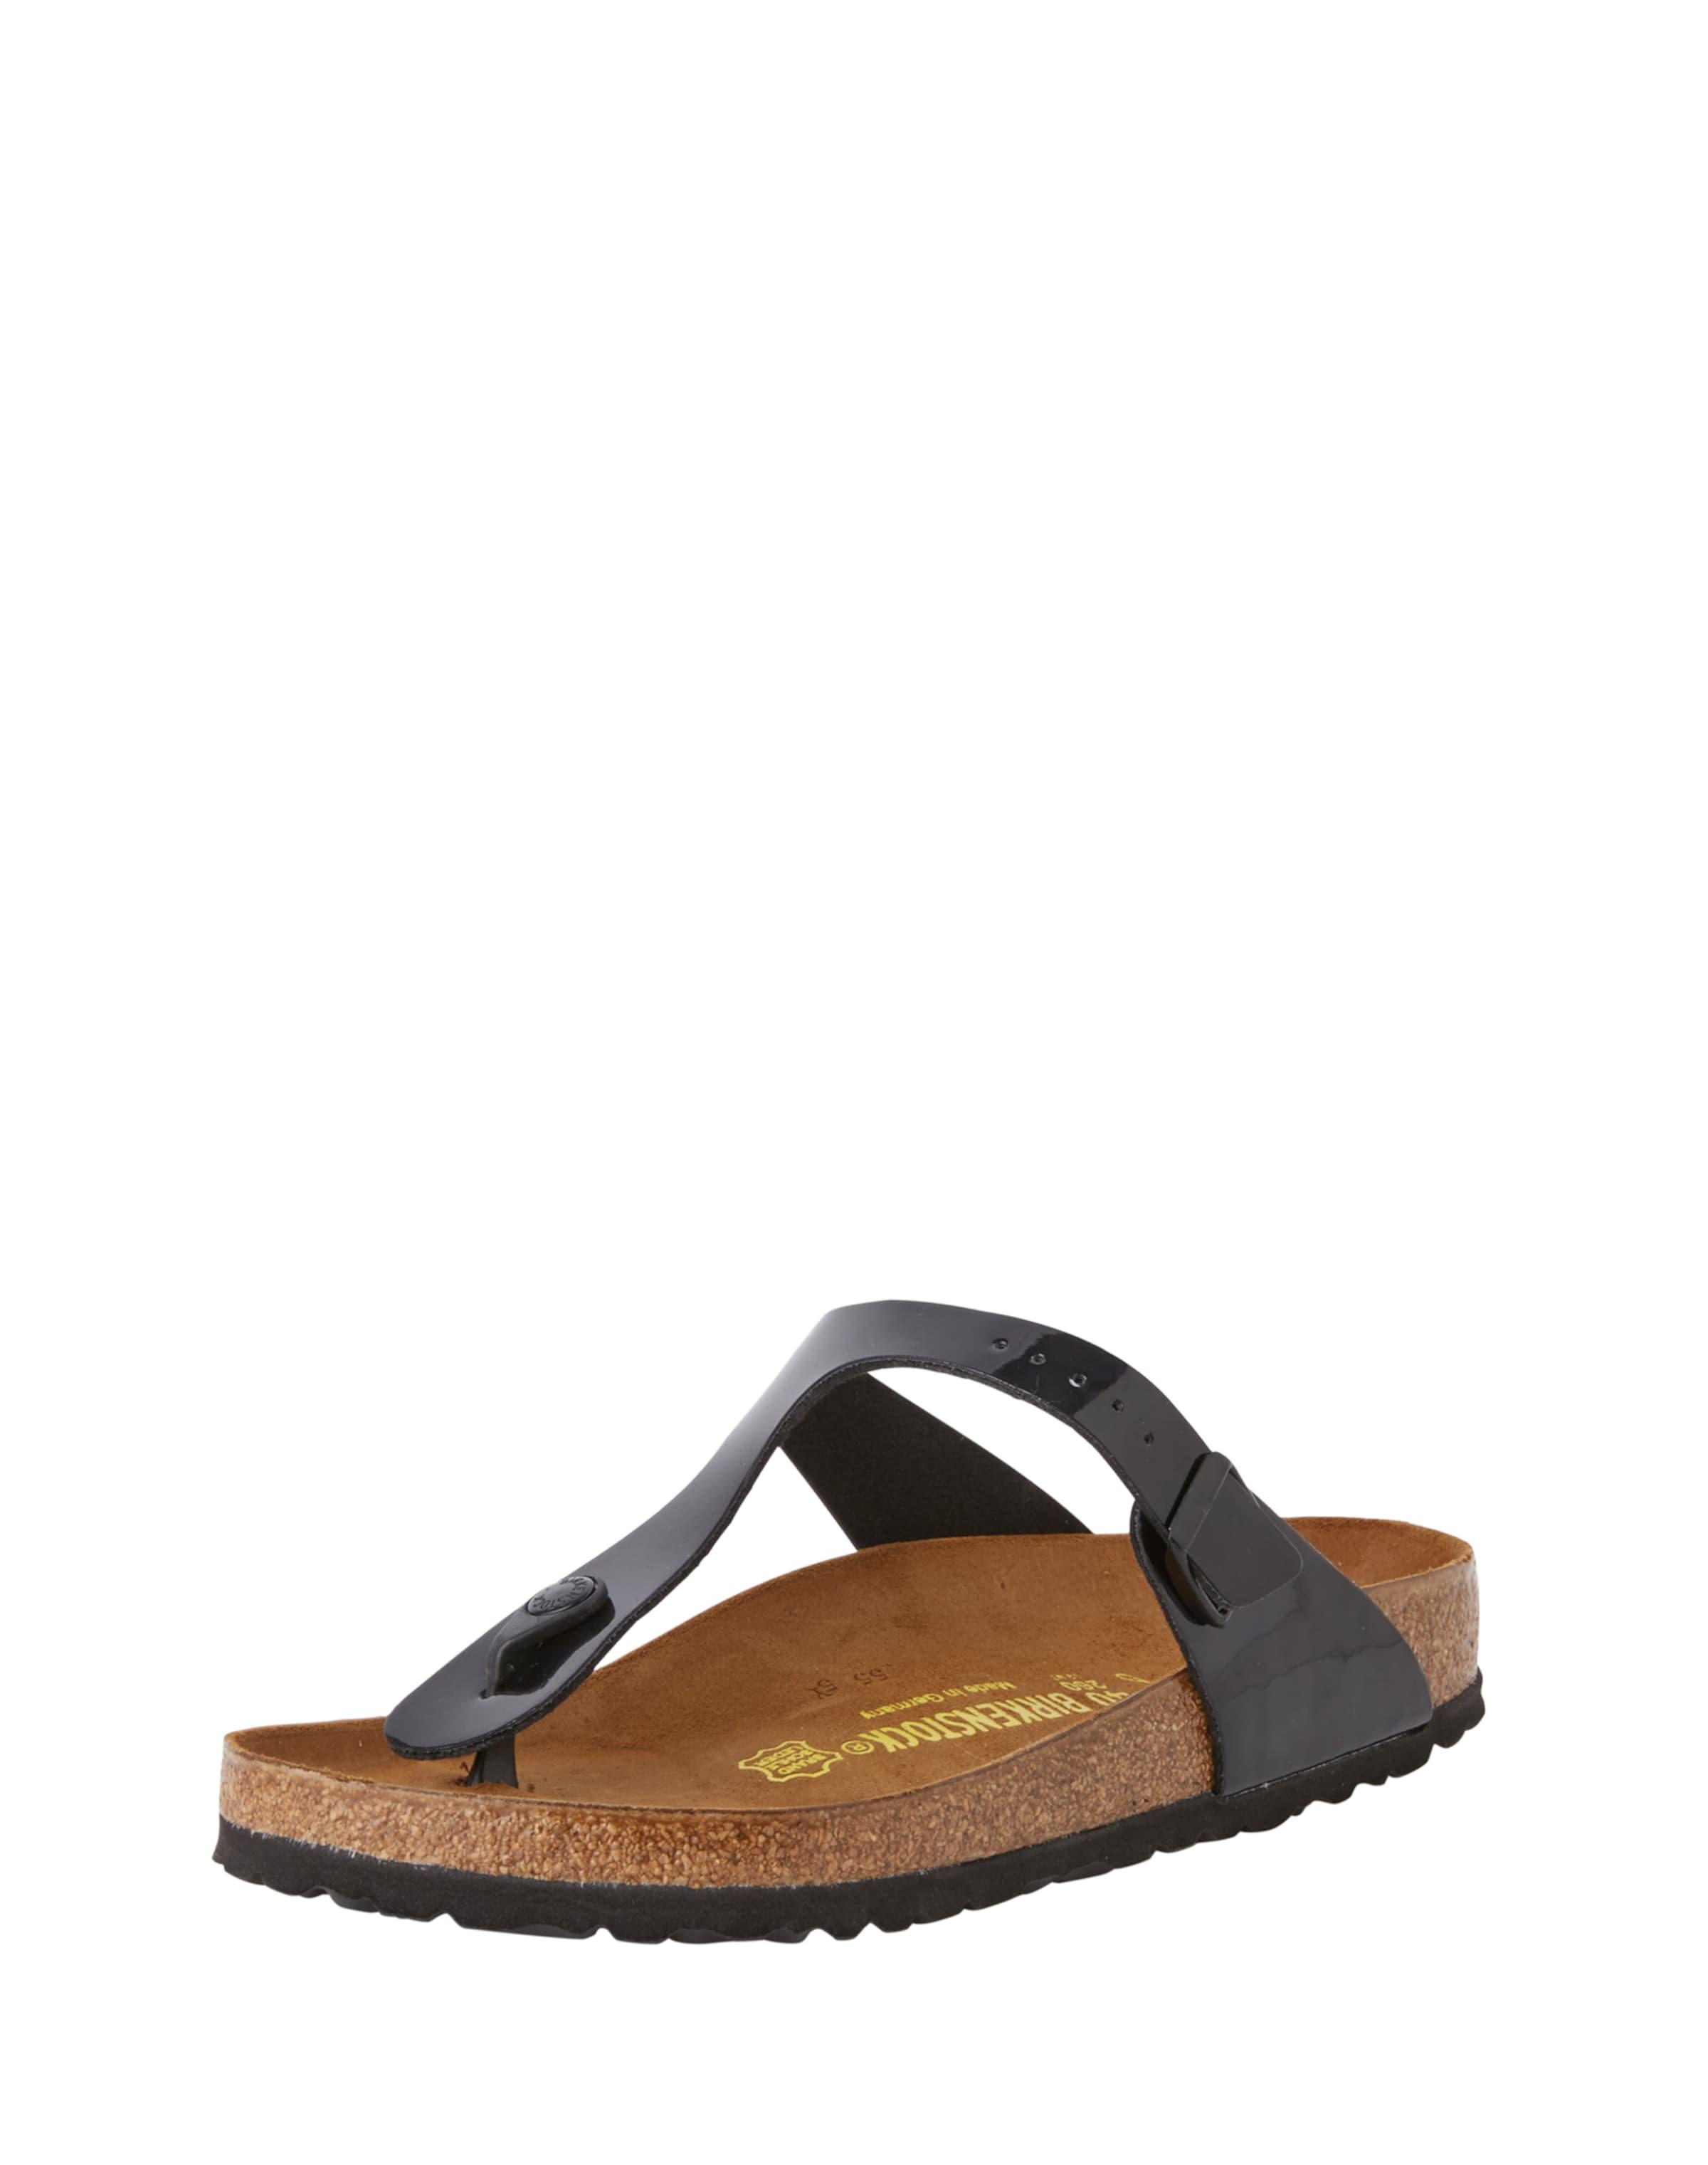 BIRKENSTOCK Zehensteg Gizeh Normal Verschleißfeste billige Schuhe